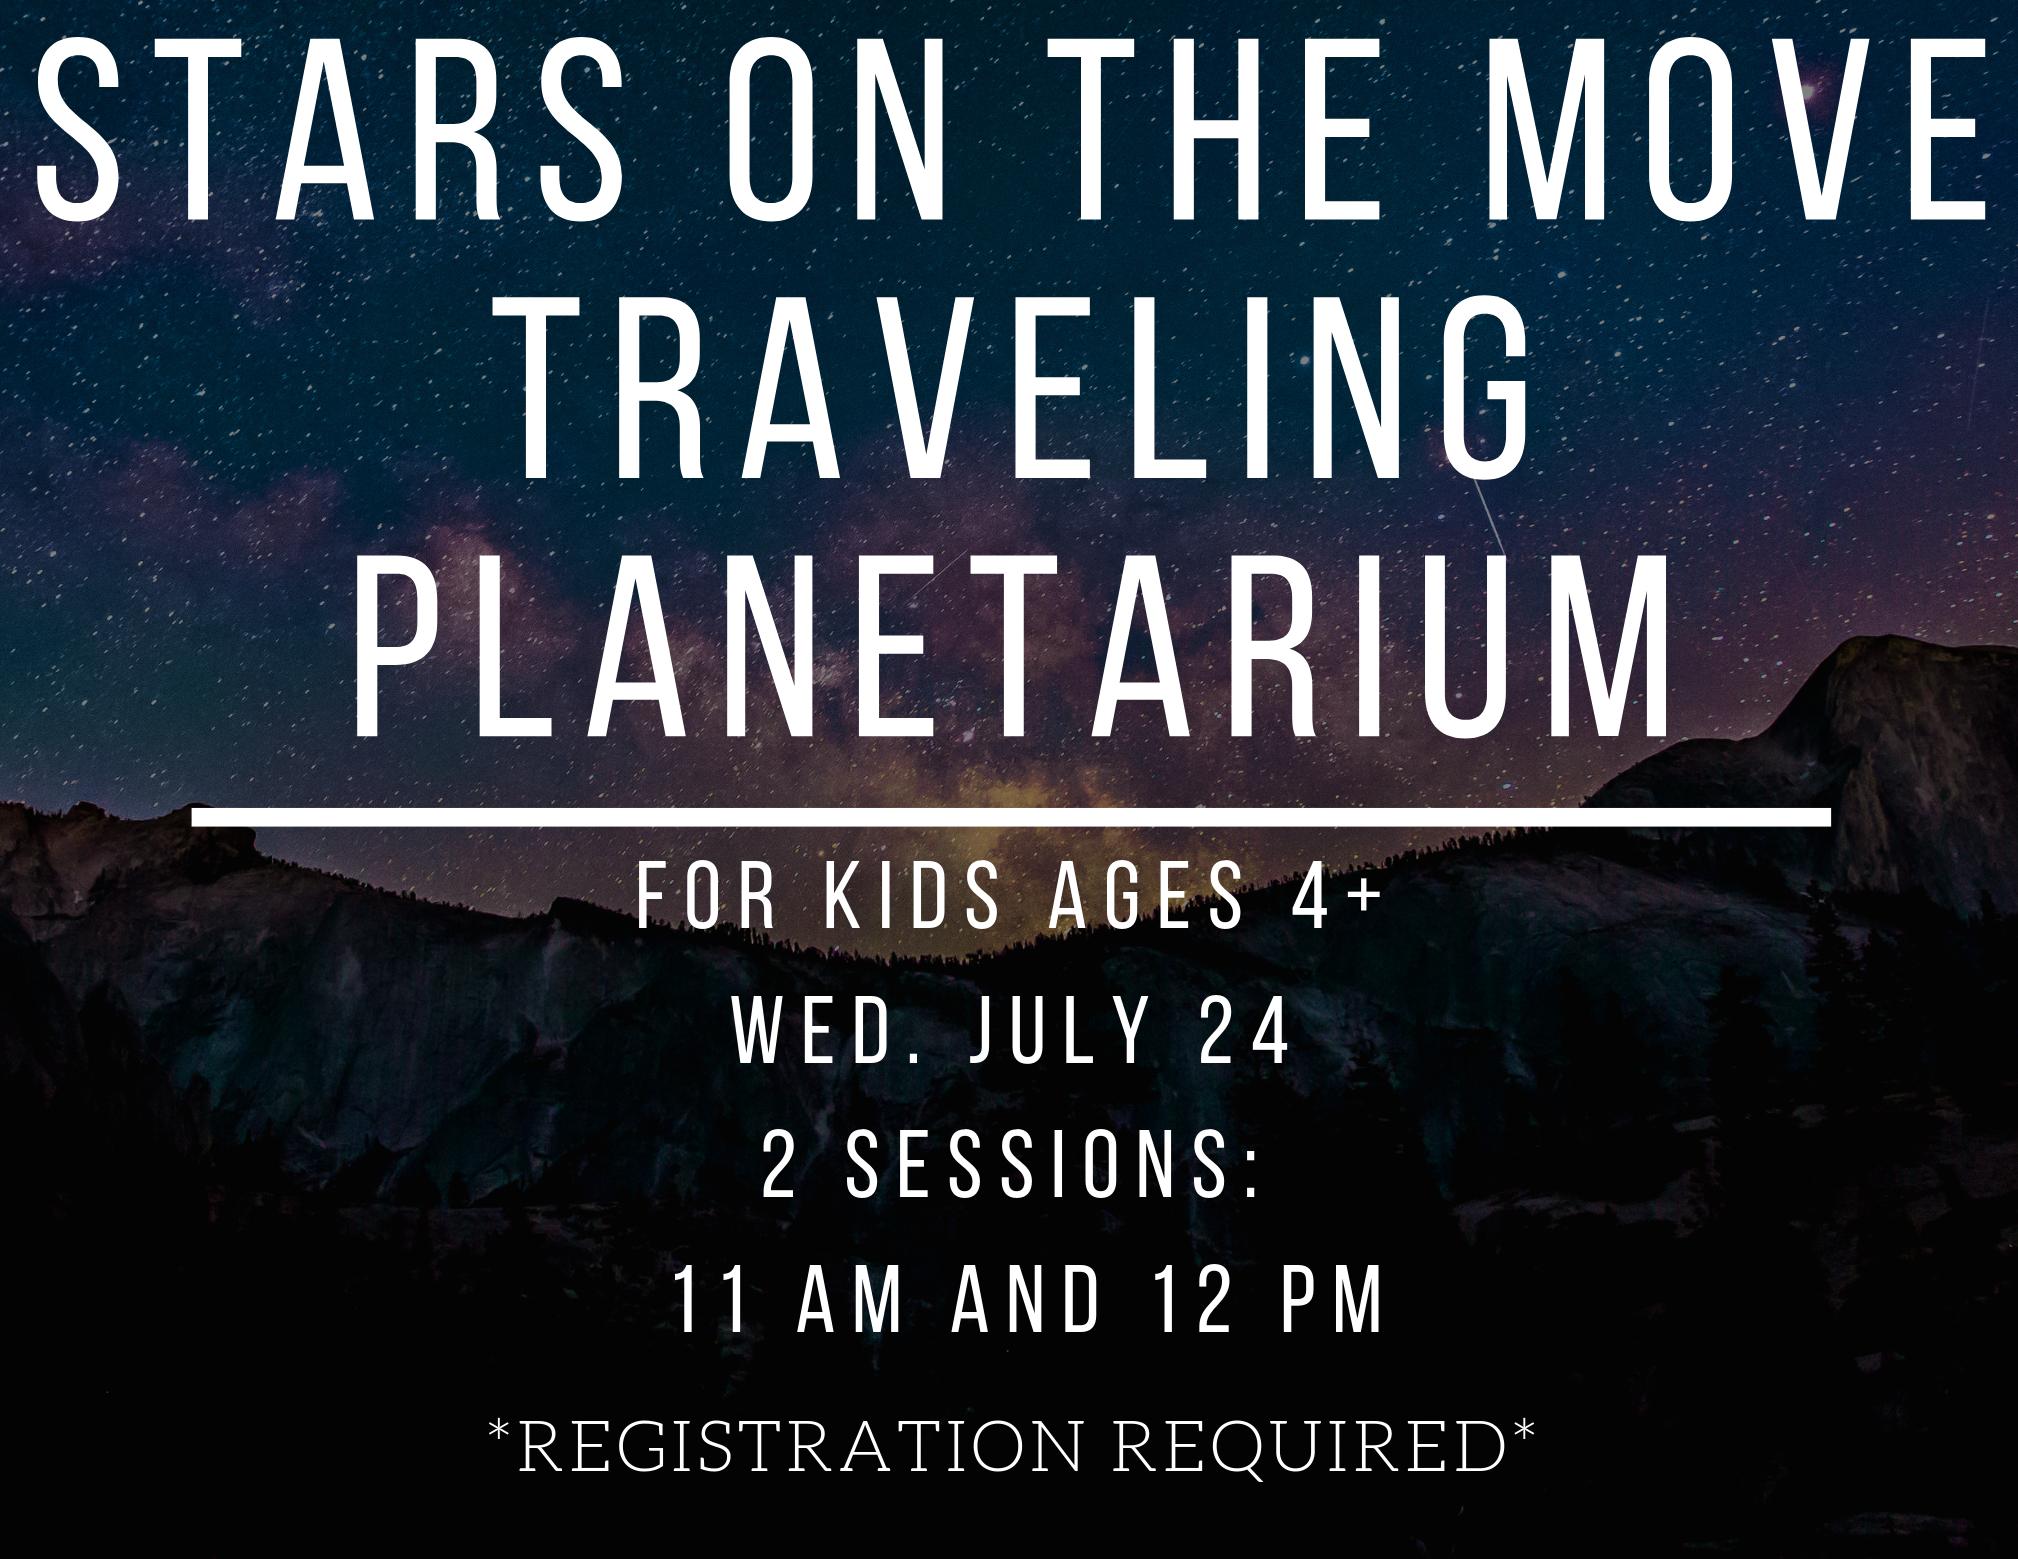 Stars on the Move Planetarium Session 2